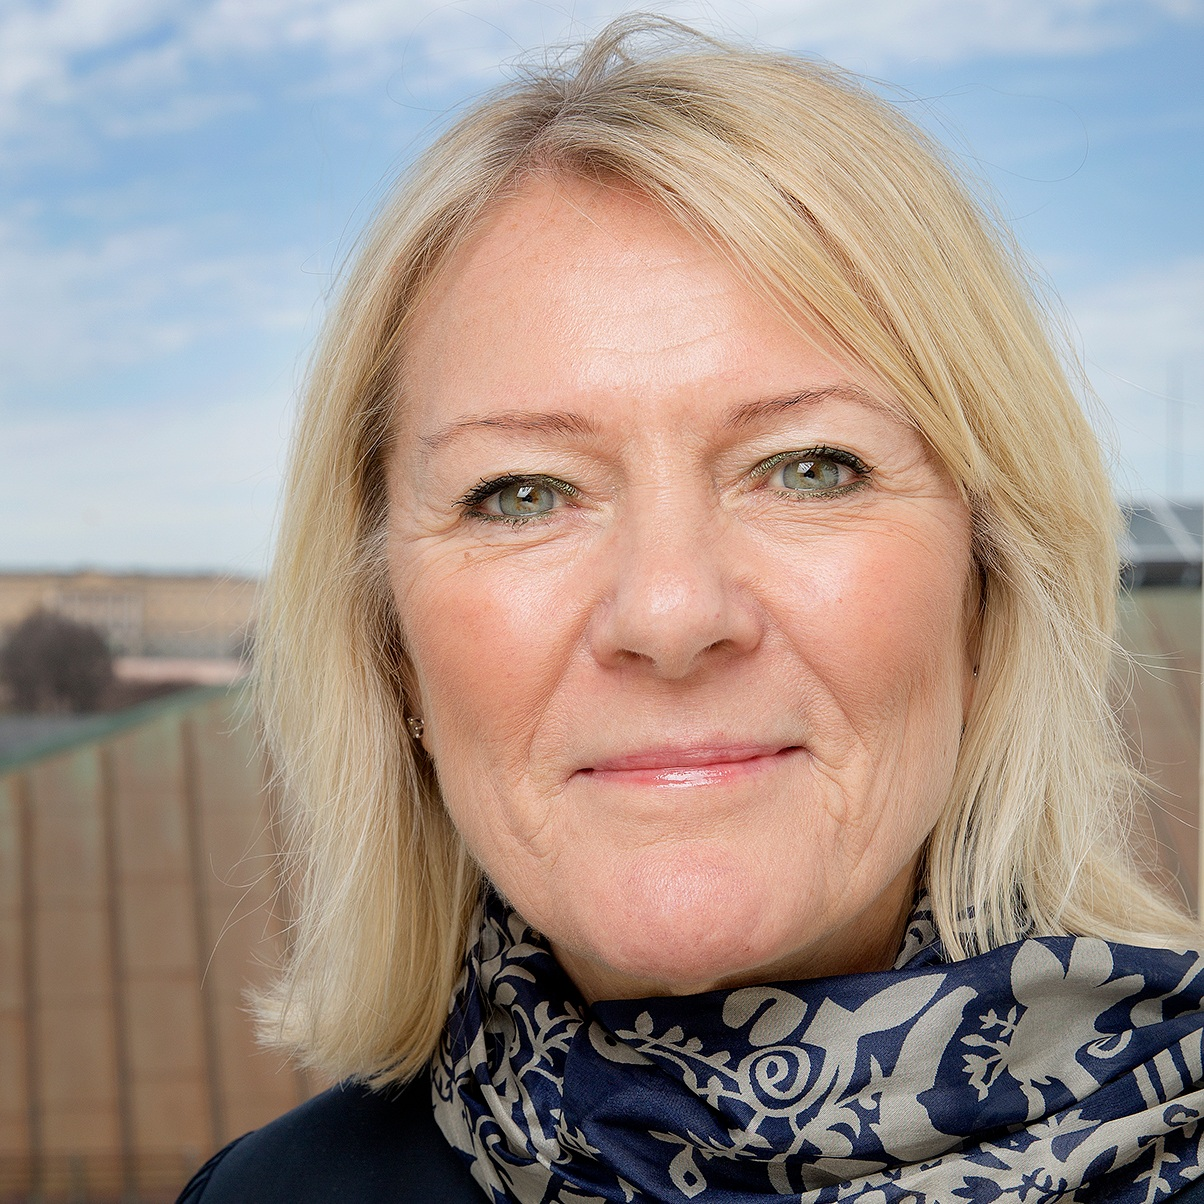 Kristin Clemet  Daglig leder i Civita og tidligere politiker (H)